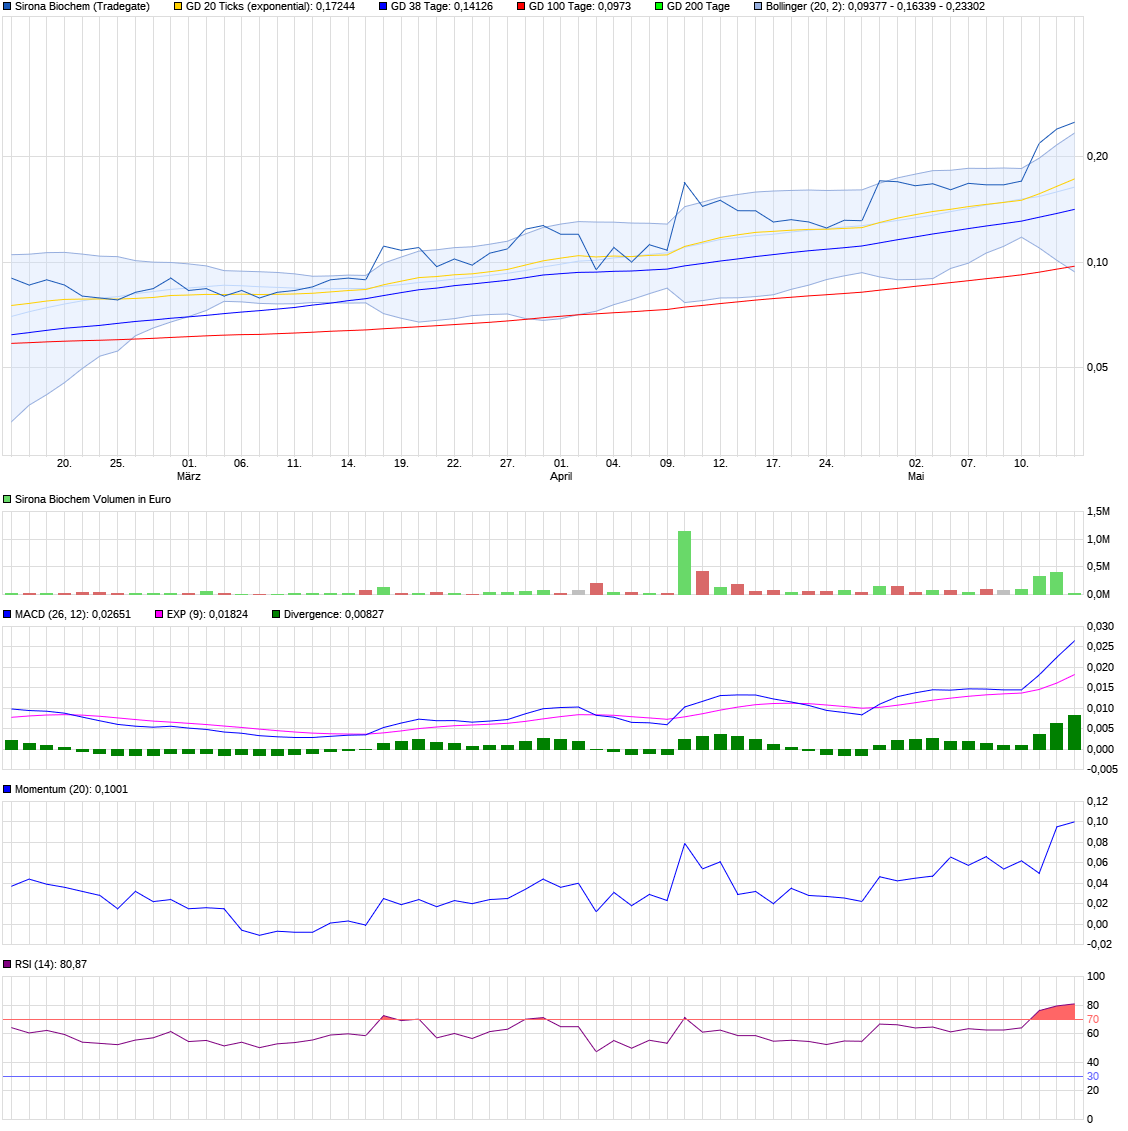 chart_quarter_sironabiochem.png